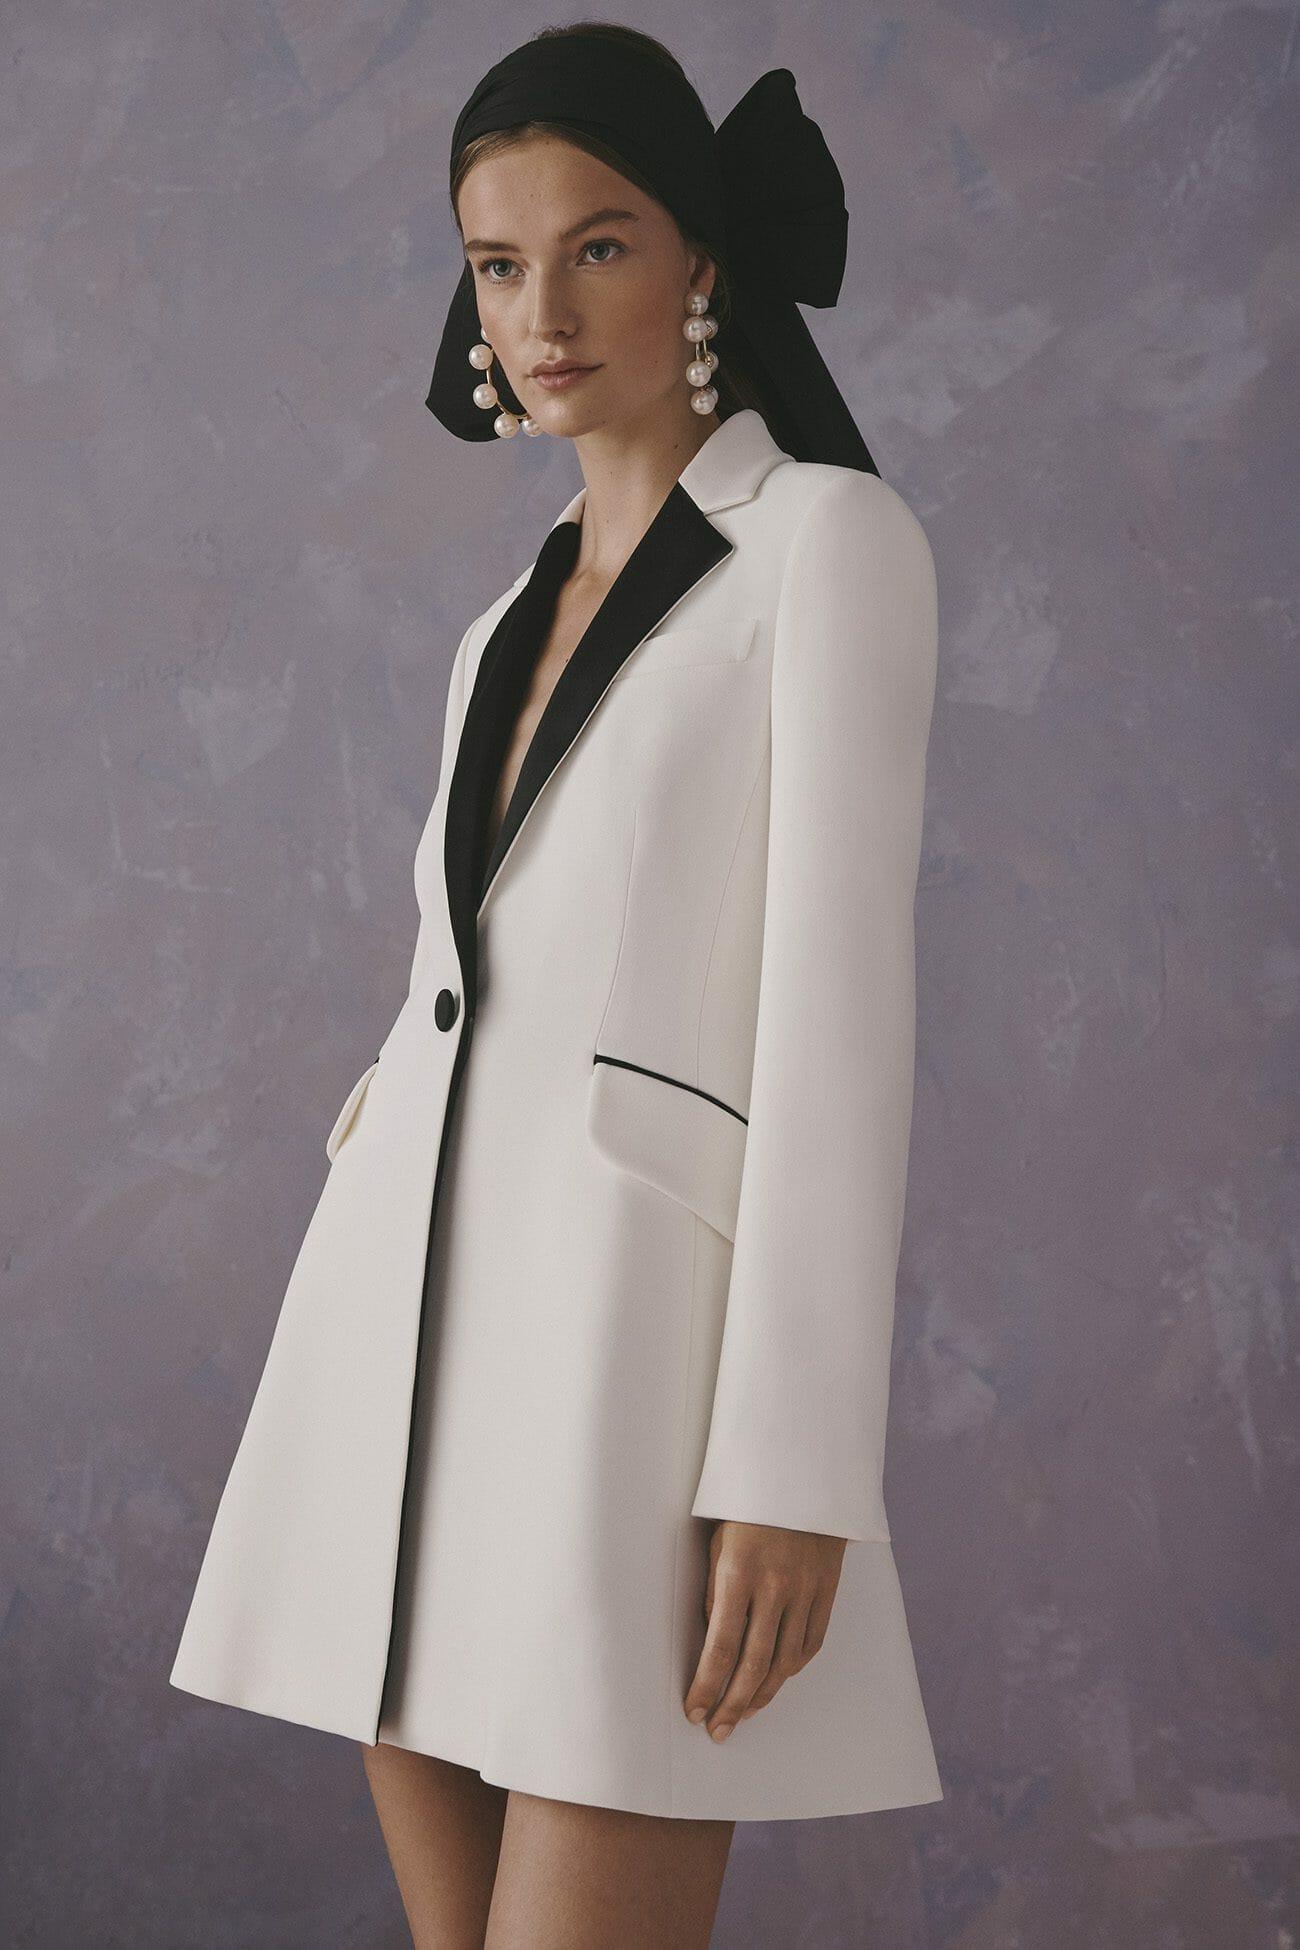 Carolina Herrera New York Resort 2020 Coleção white suit dress